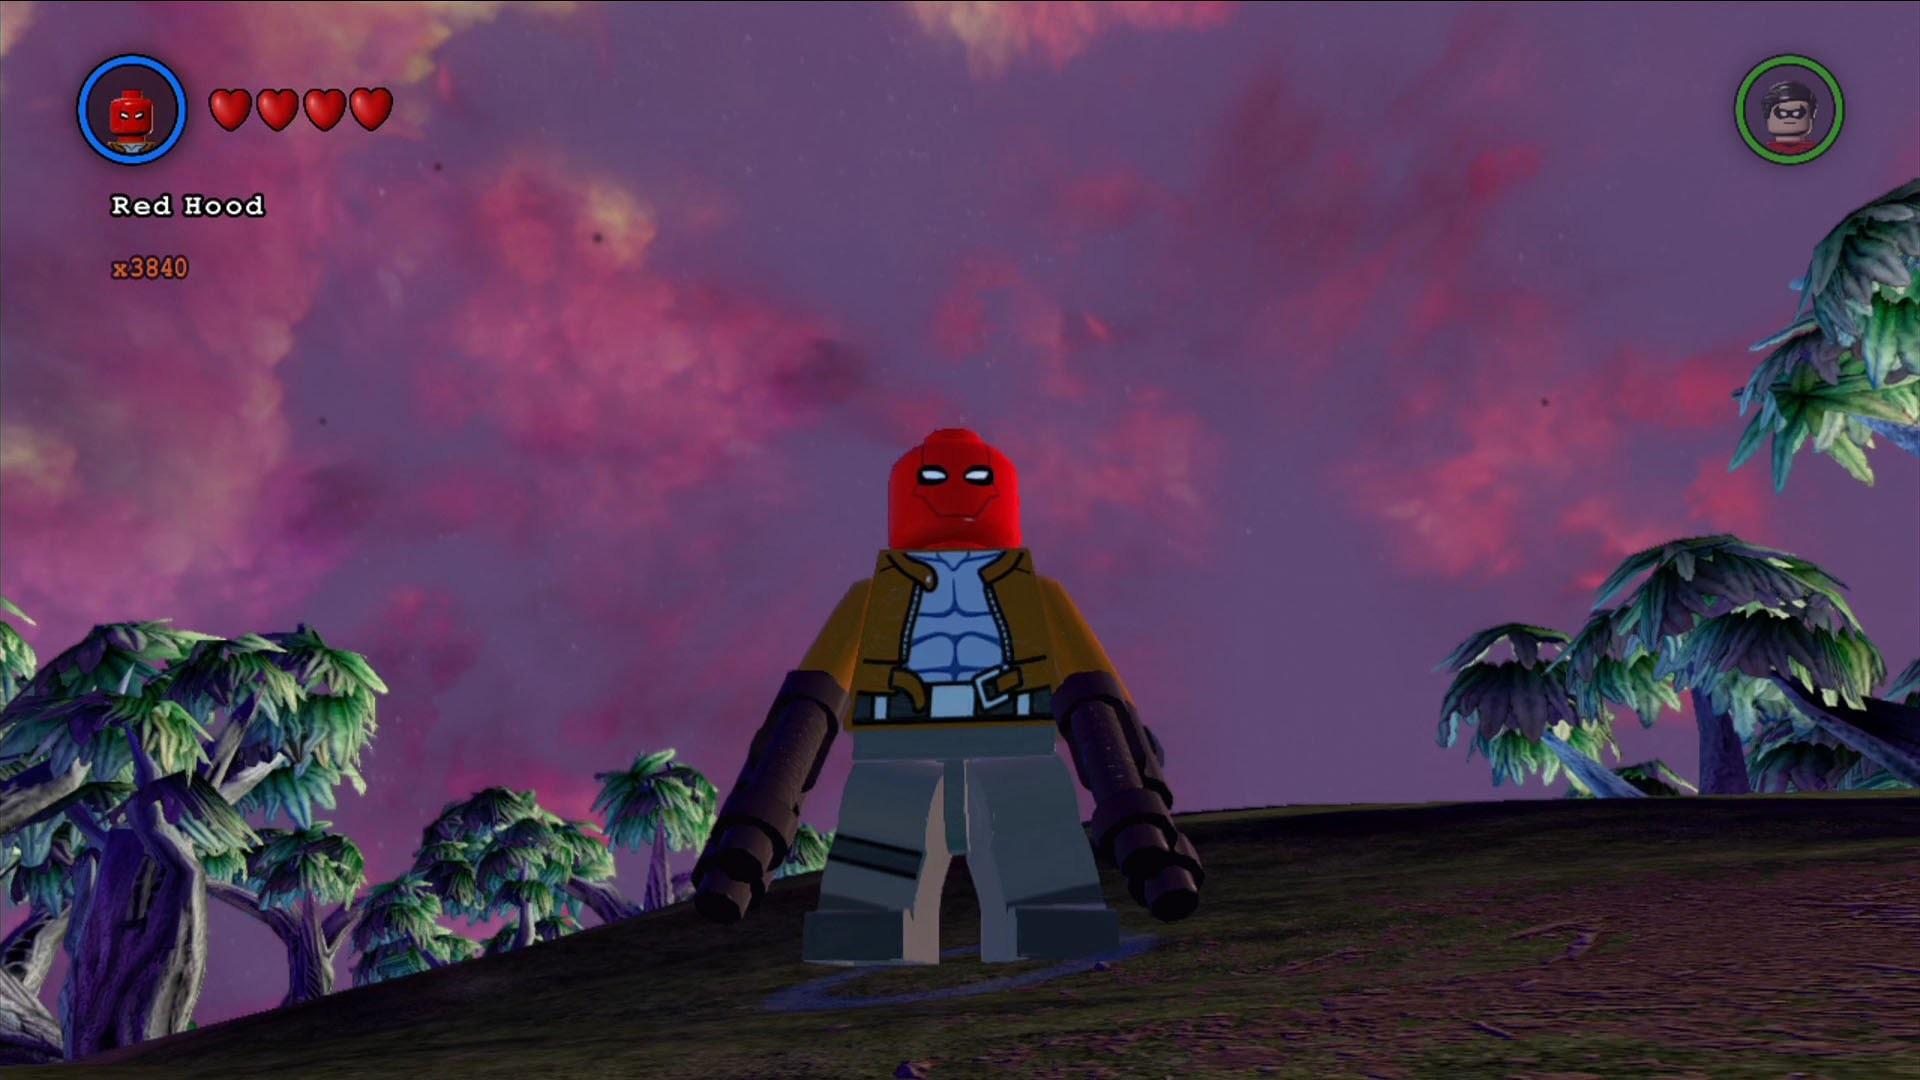 LEGO Batman 3: Beyond Gotham – Red Hood Free Roam Gameplay [HD] – YouTube